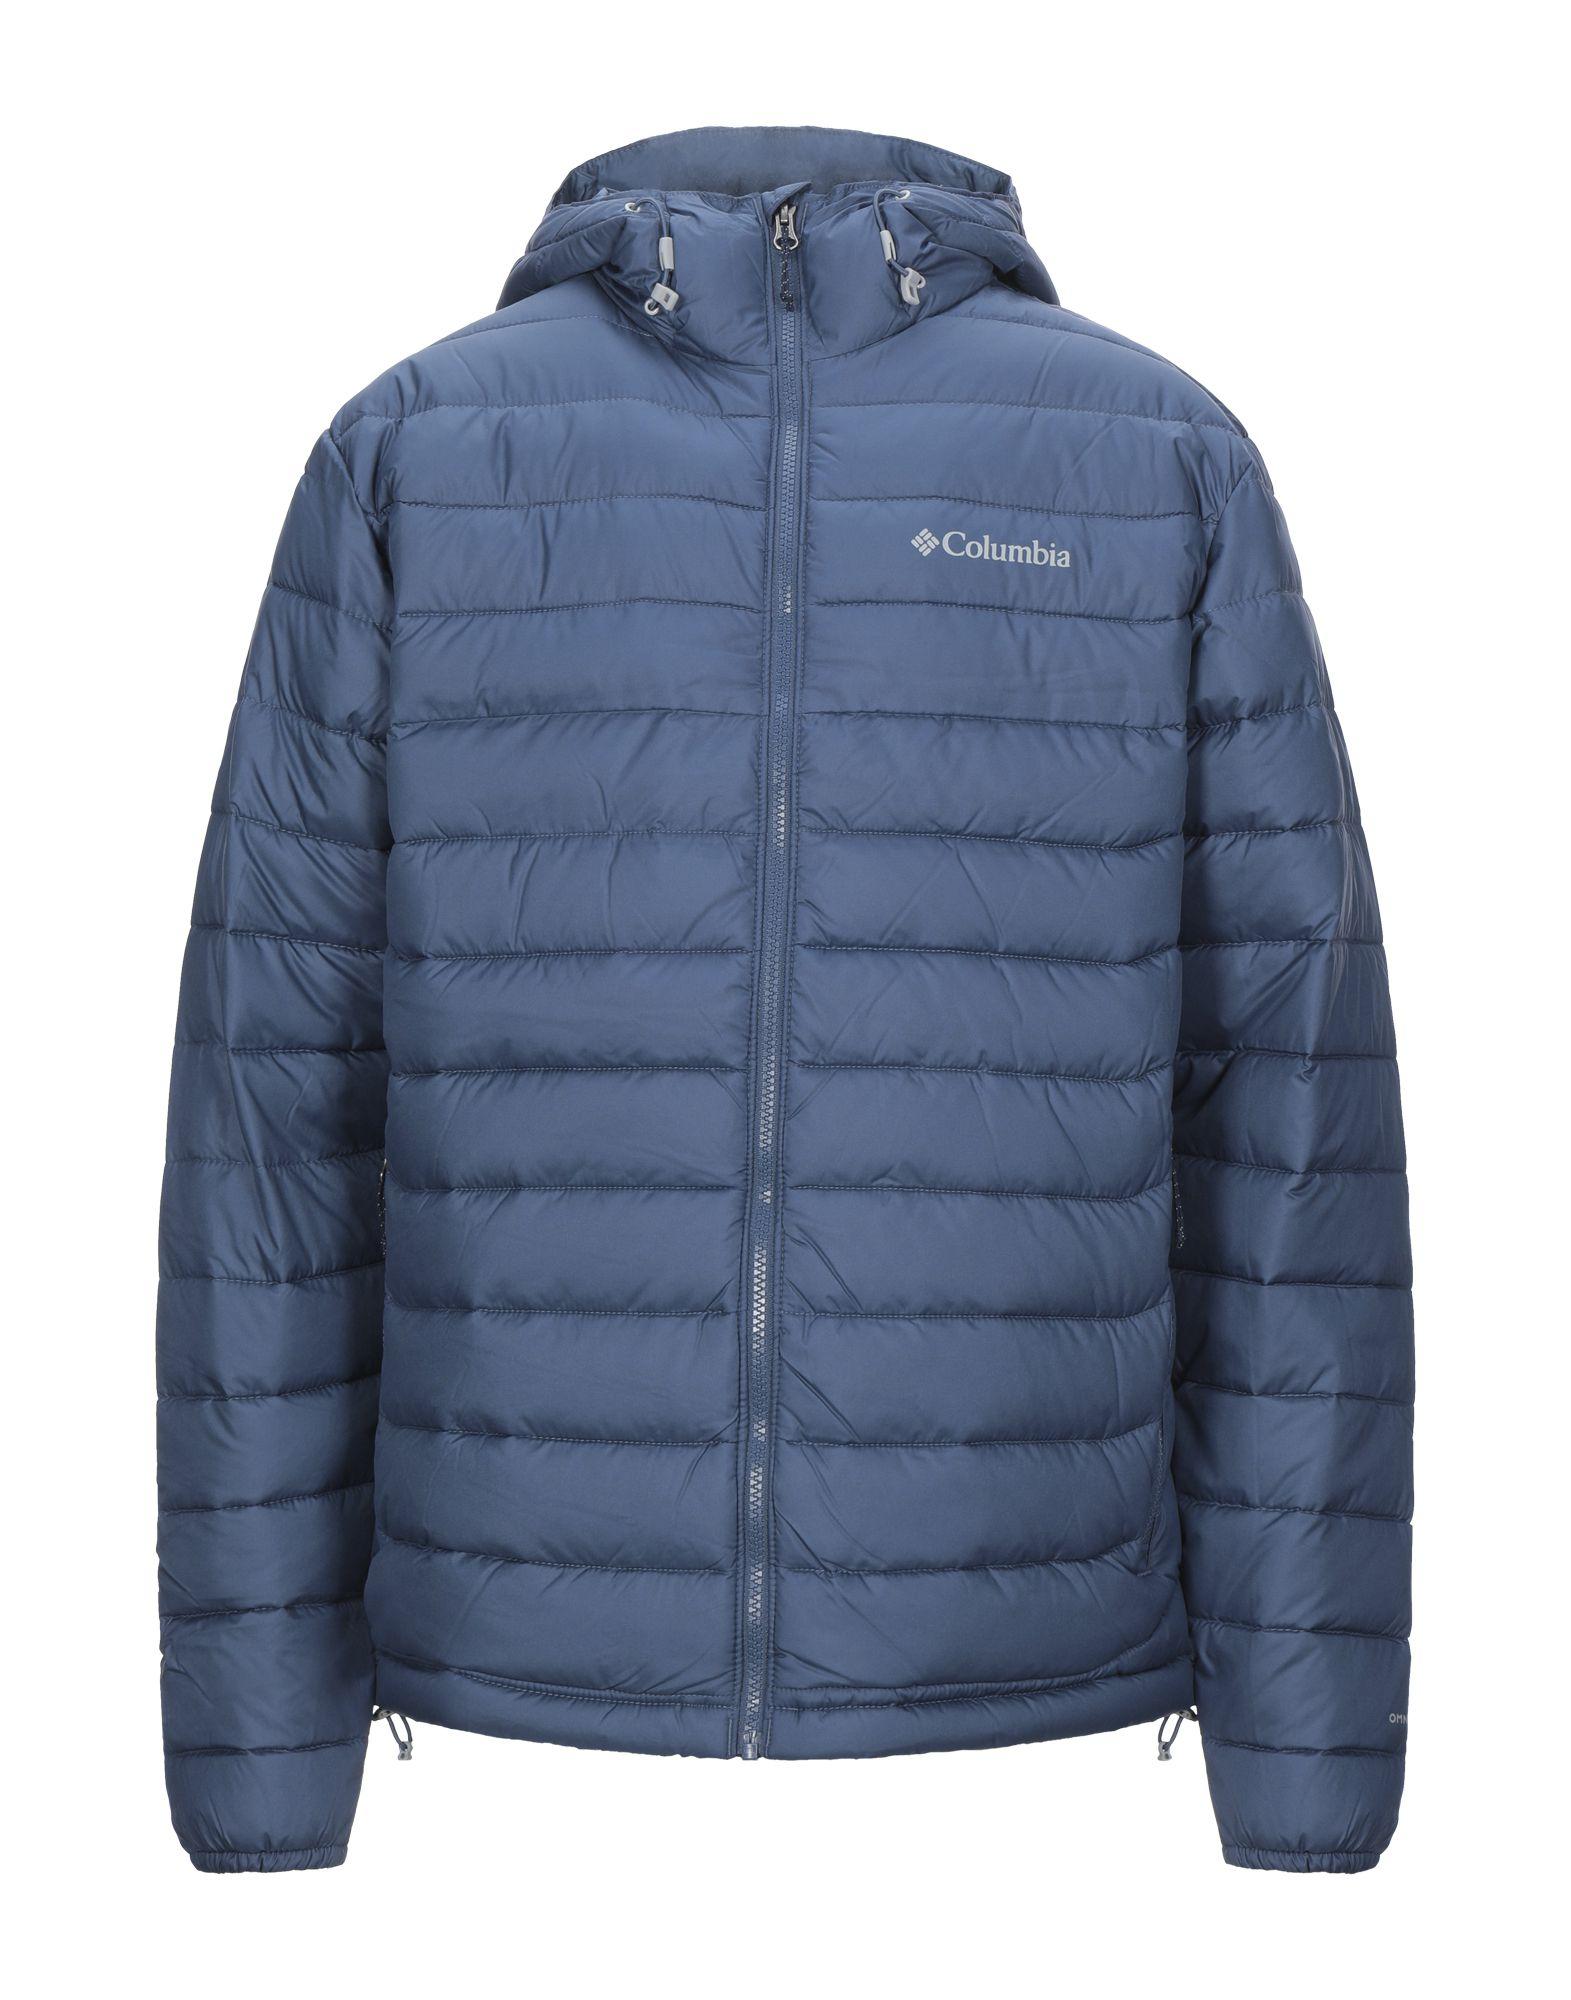 COLUMBIA Куртка куртка мембранная мужская columbia bradley peak™ размер 46